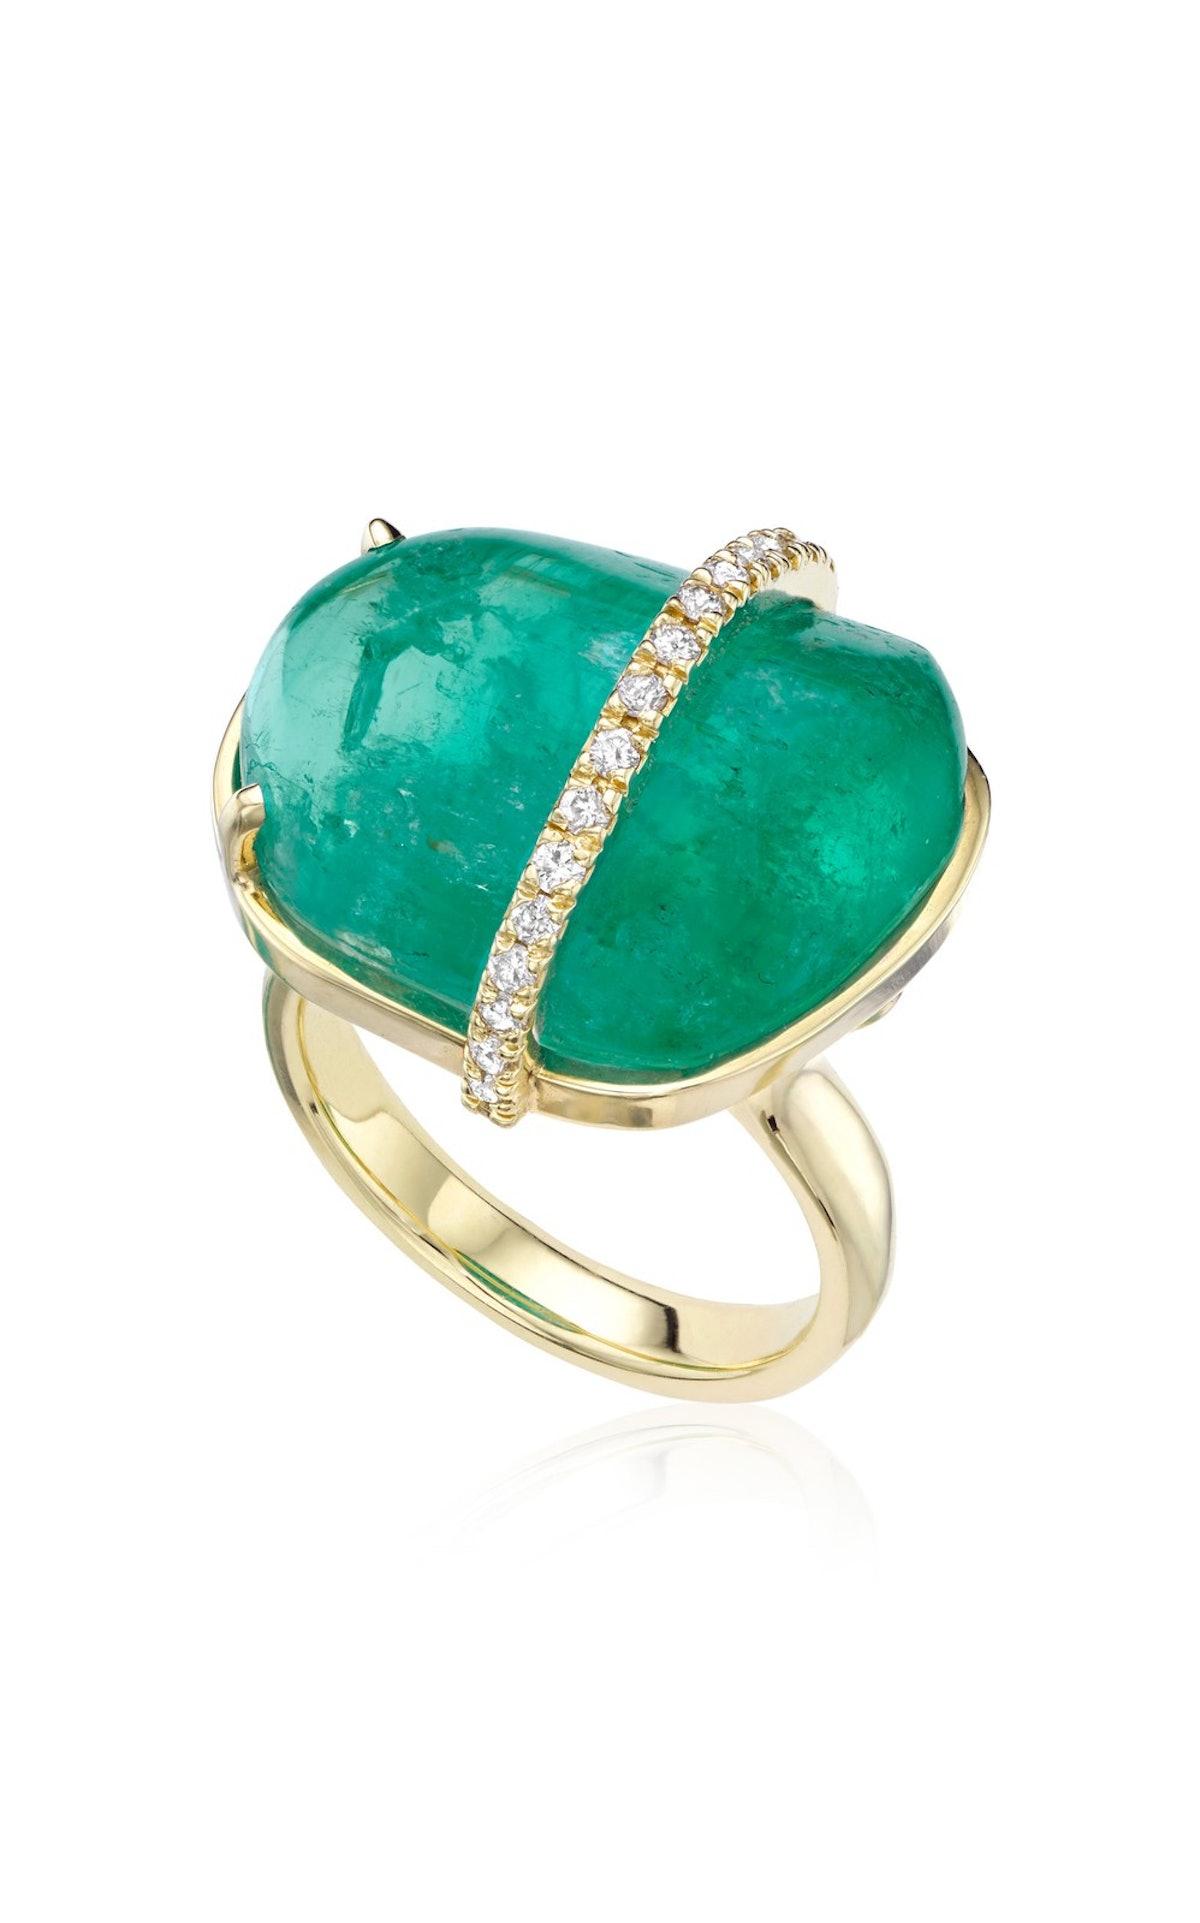 18K Green Gold and Muzo Emerald Ring